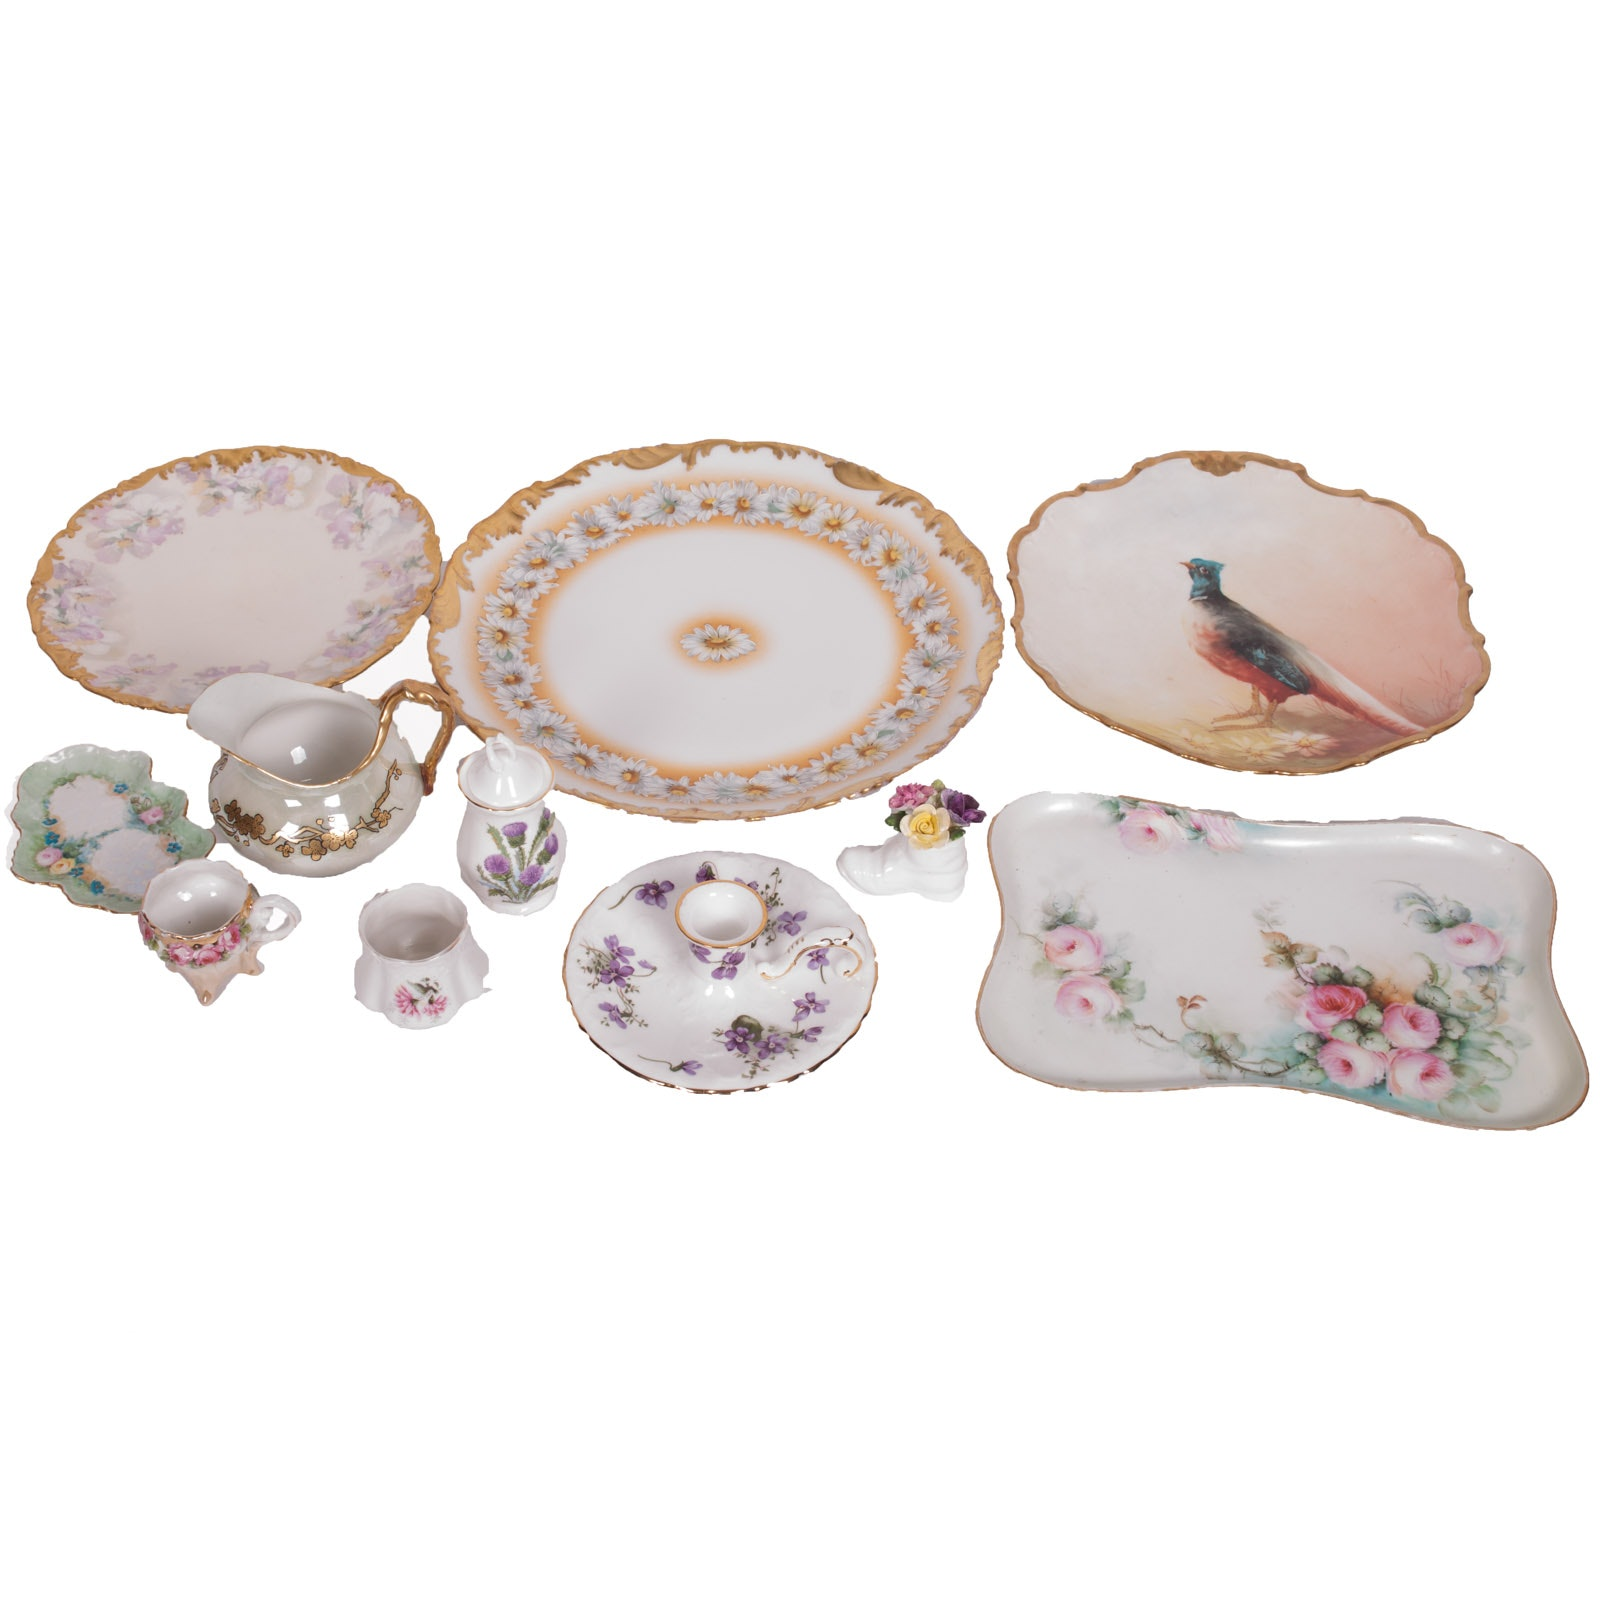 Floral Porcelain Assortment Featuring Limoges